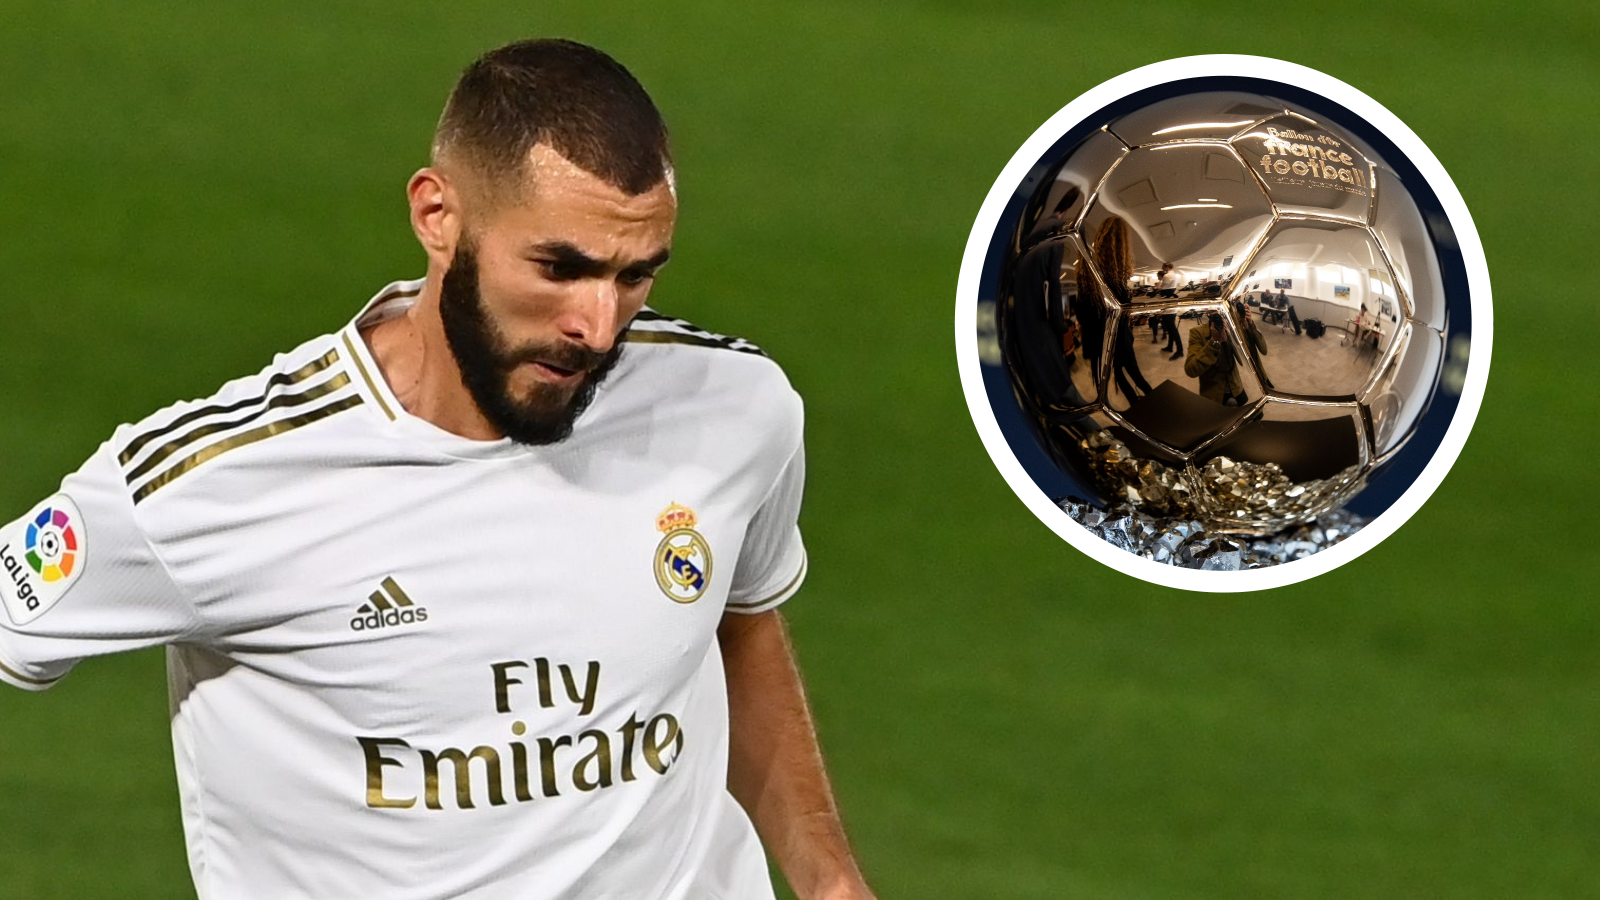 Zidane: Its been a great season